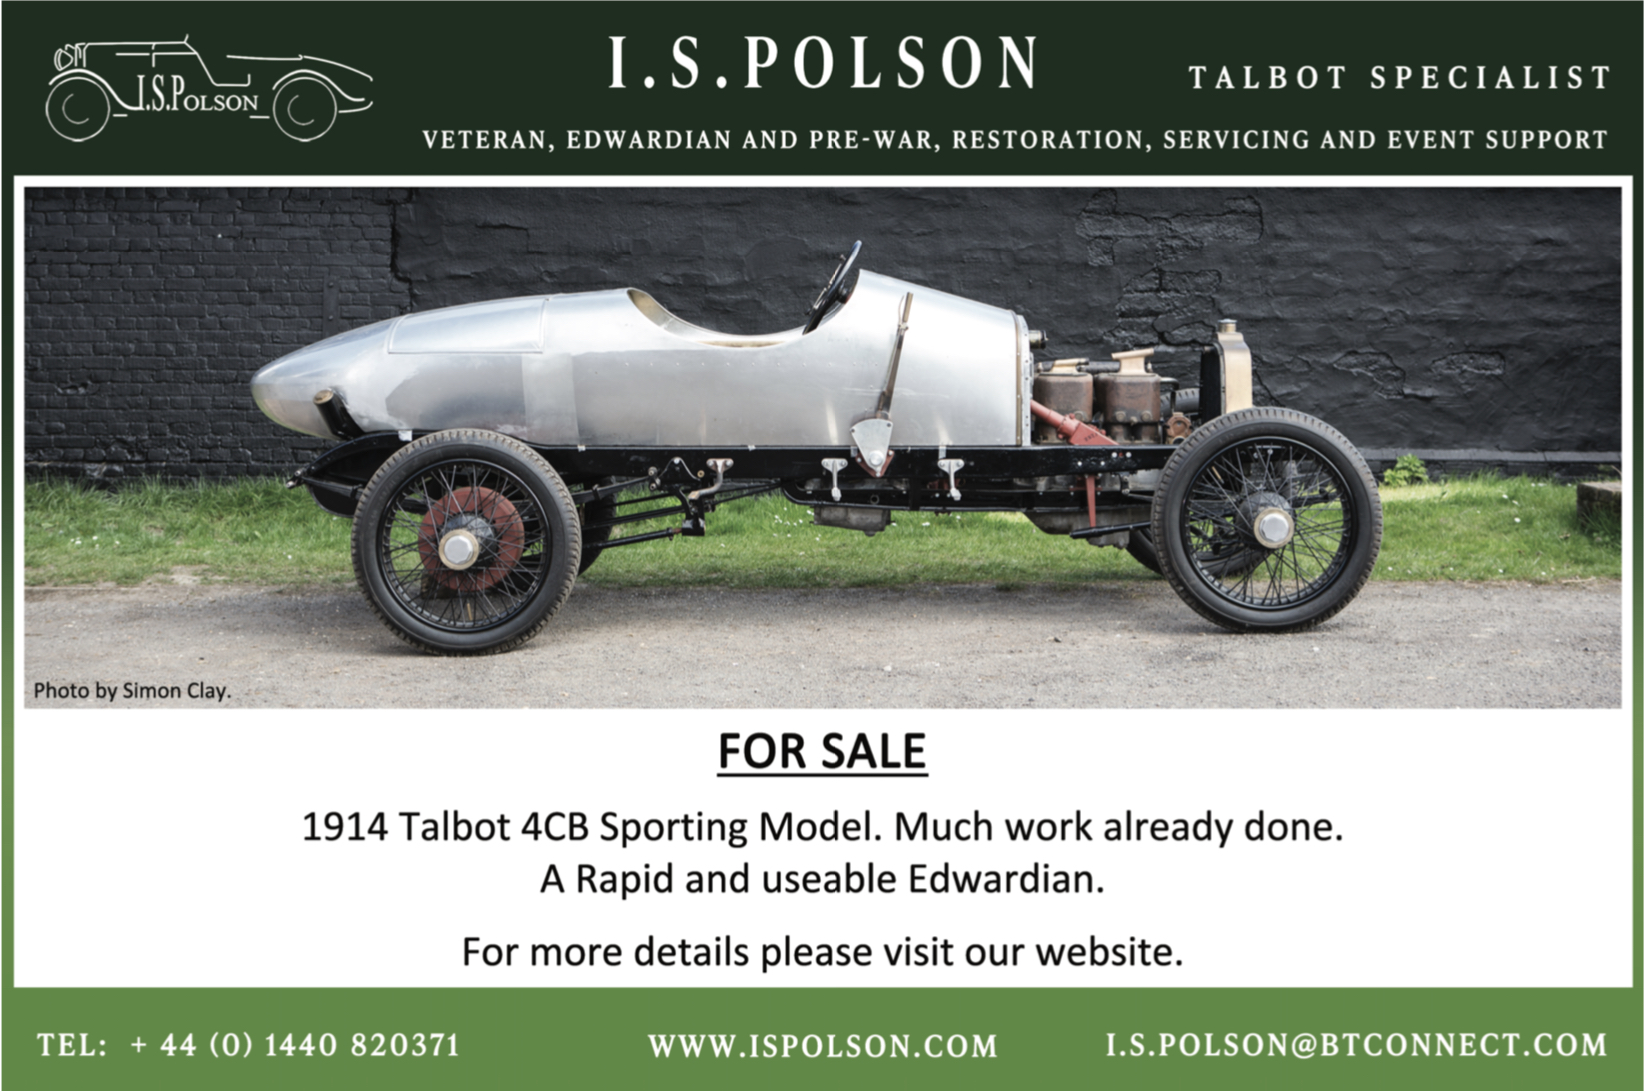 Talbot Cars Specialist - Veteran Edwardian pre-war car auto specialists, servicing, restoration, event support,